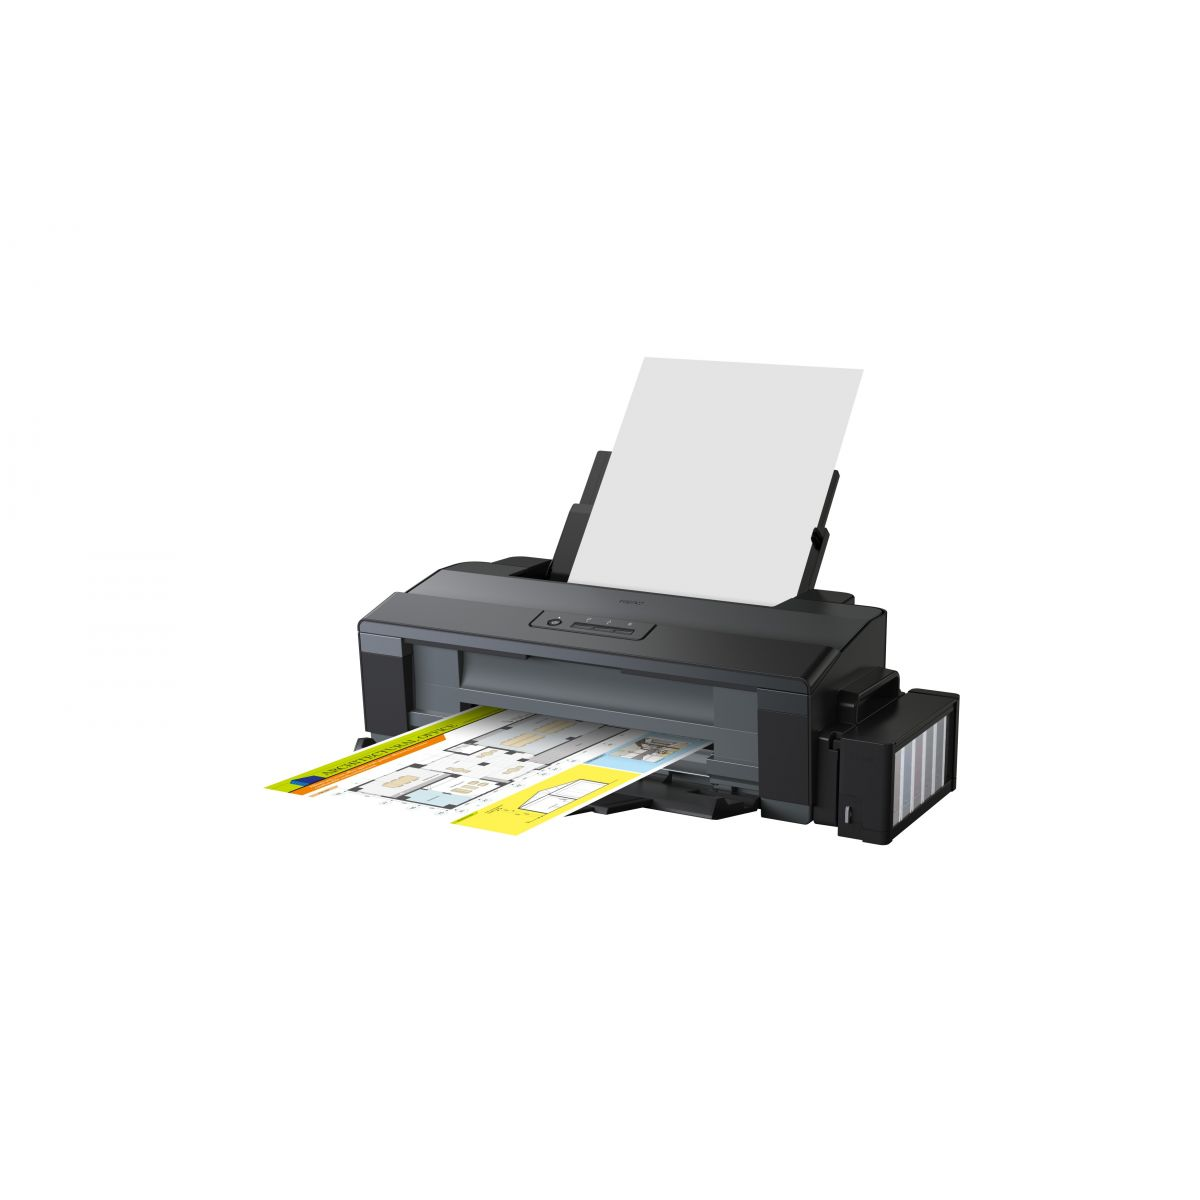 Impressora Epson A3 Tanque de Tinta L1300  - Northshop São Paulo